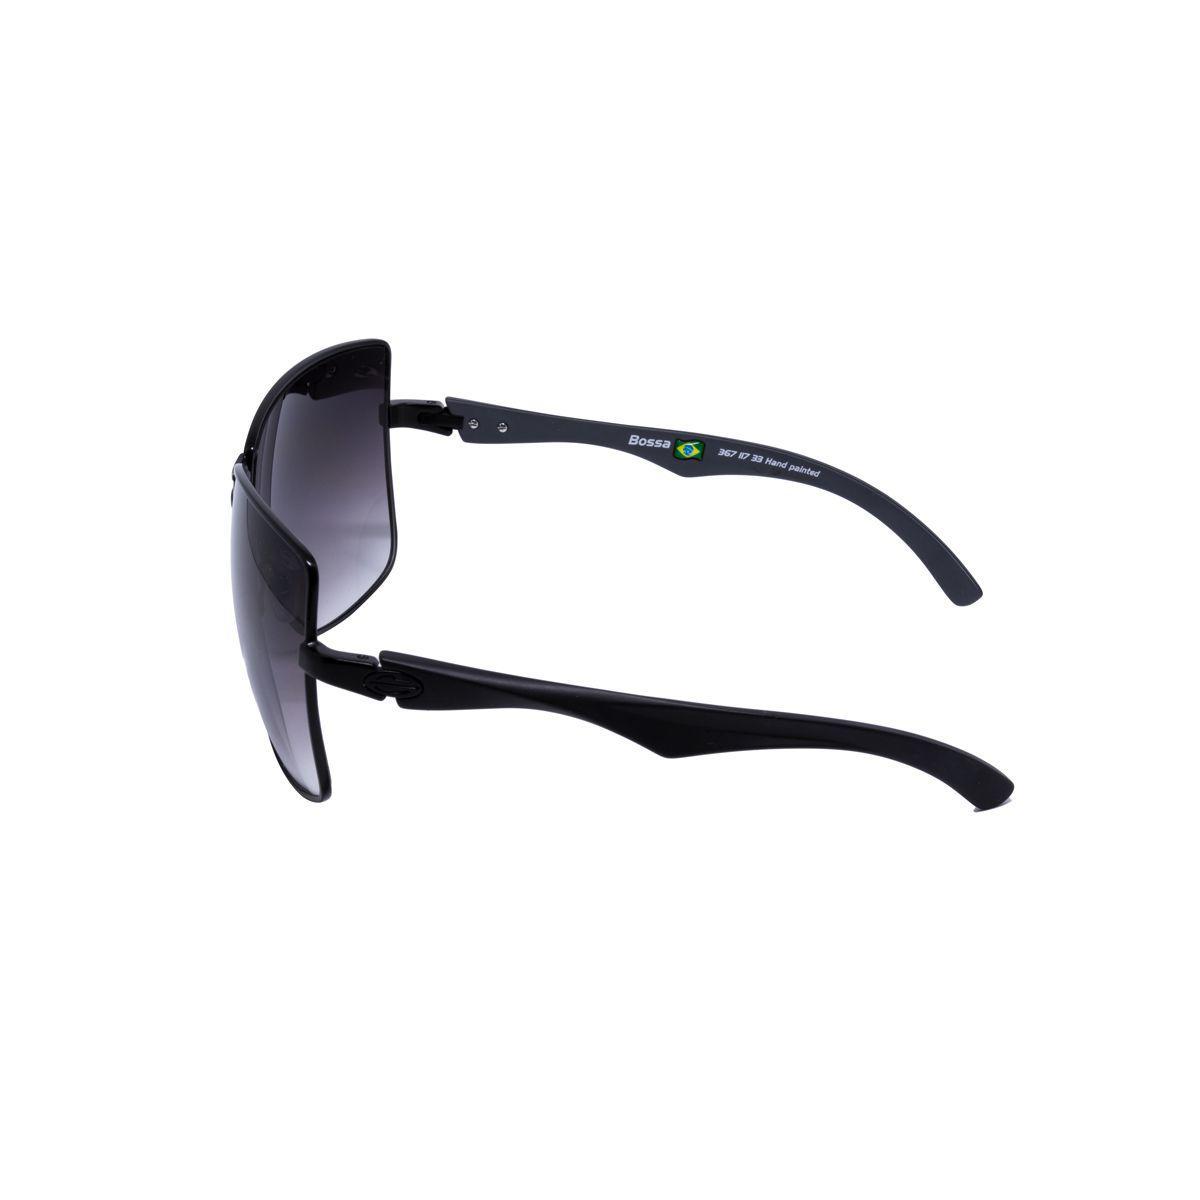 2c1cb11afd102 Óculos de Sol Mormaii Bossa 36711733 - metal preto, lente cinza degradê R   366,00 à vista. Adicionar à sacola